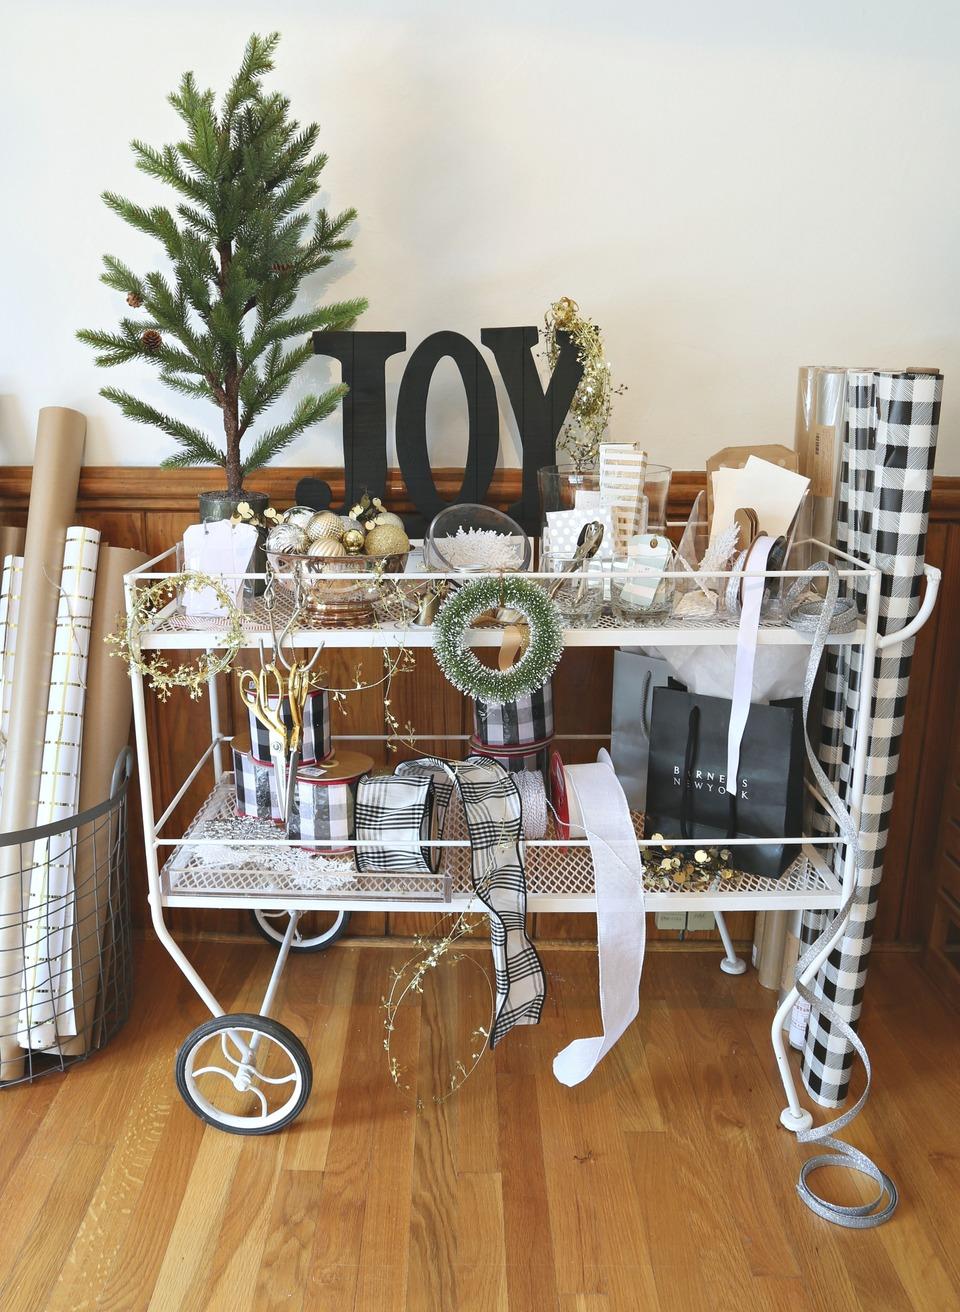 Christmas Gift Wrap Cart Idea